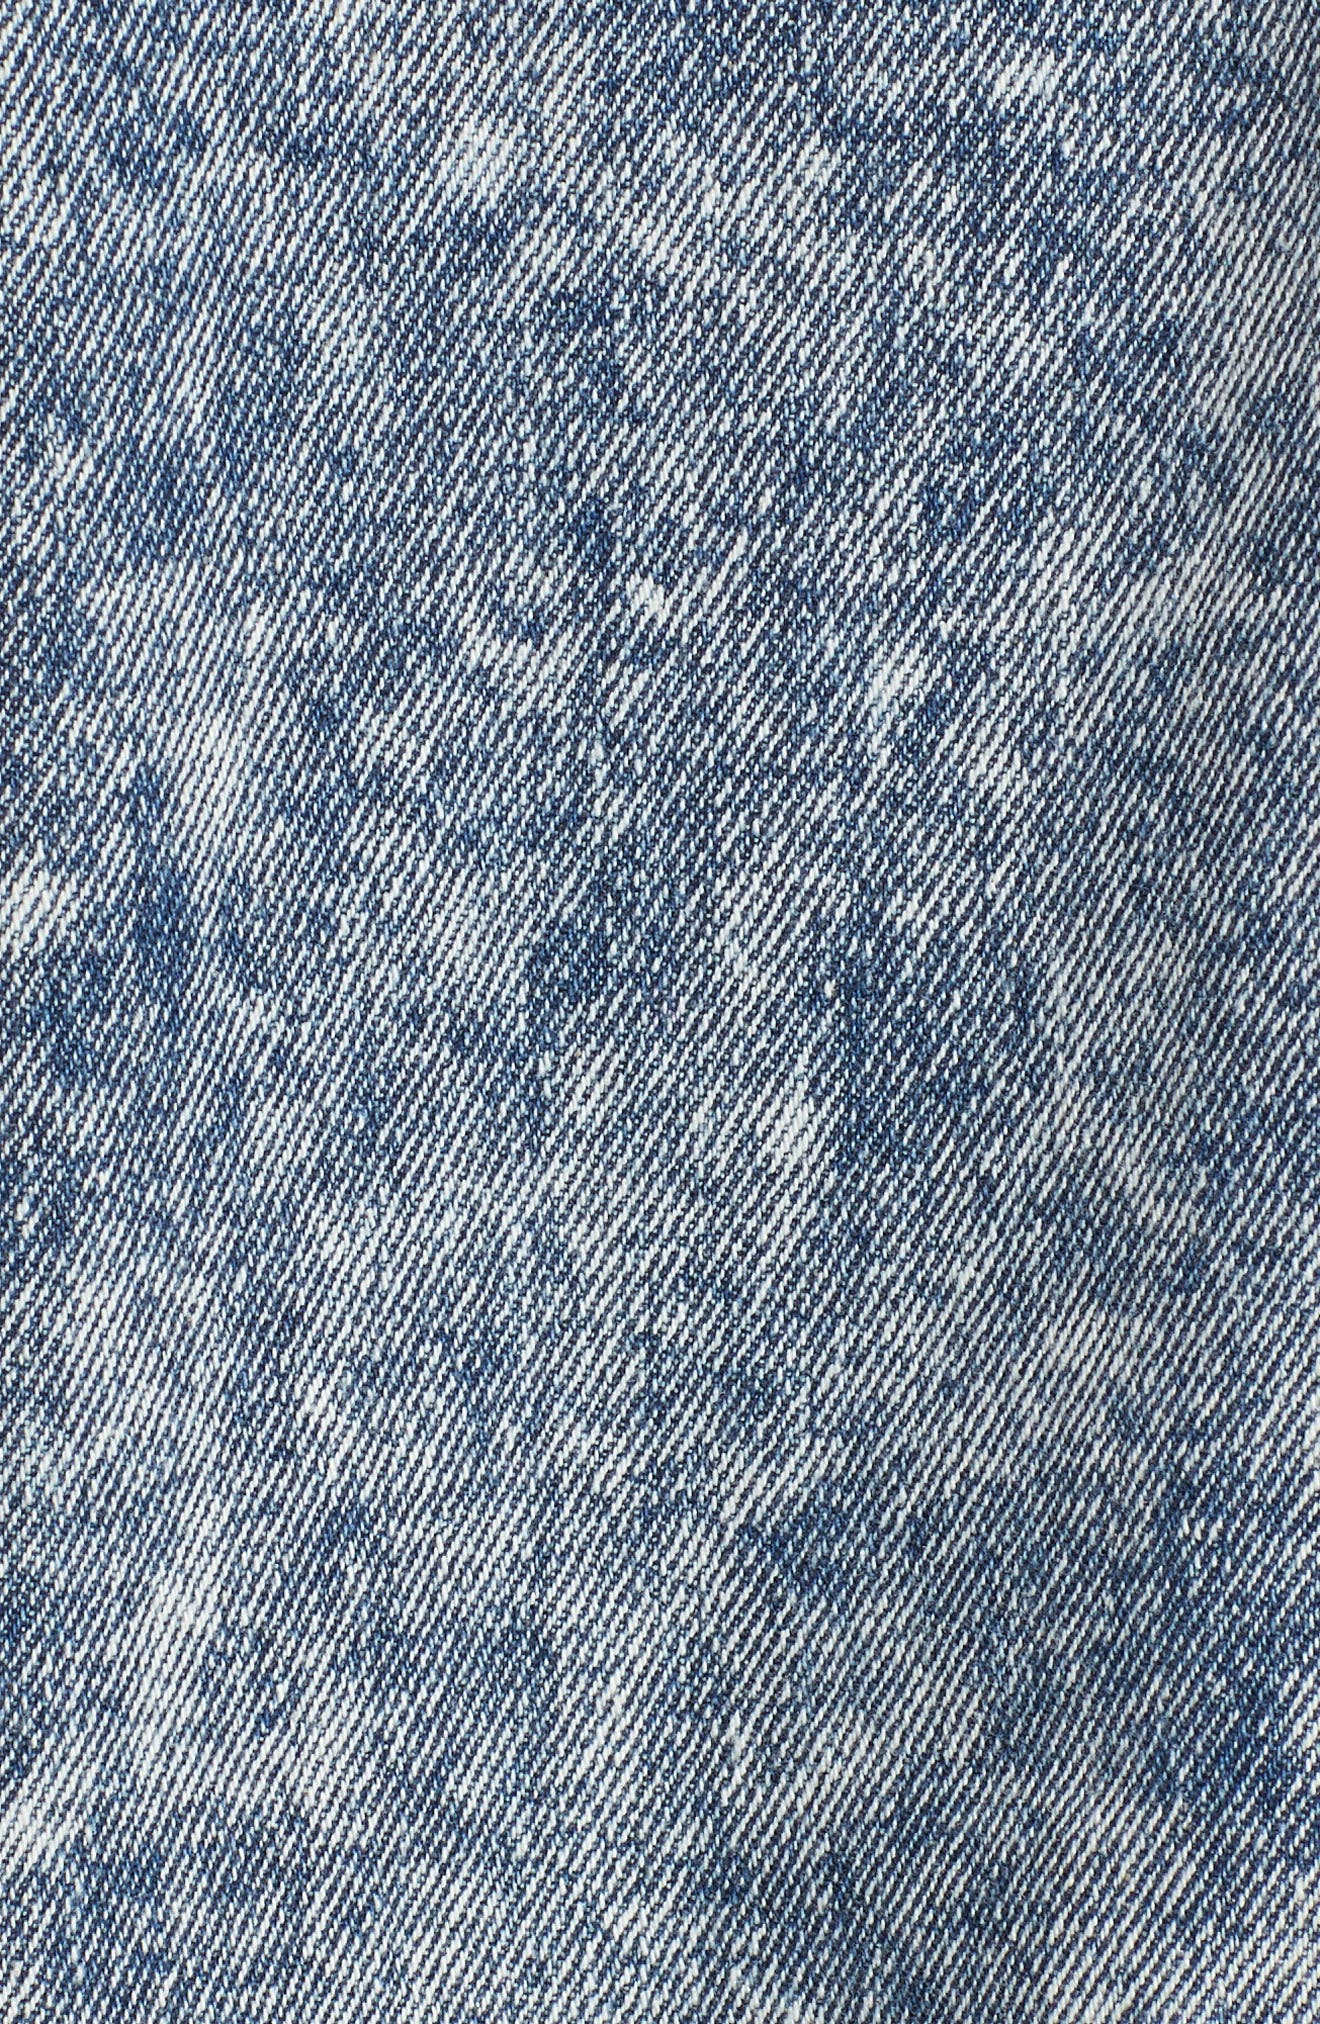 Unionbay Acid Wash Denim Jacket,                             Alternate thumbnail 7, color,                             427